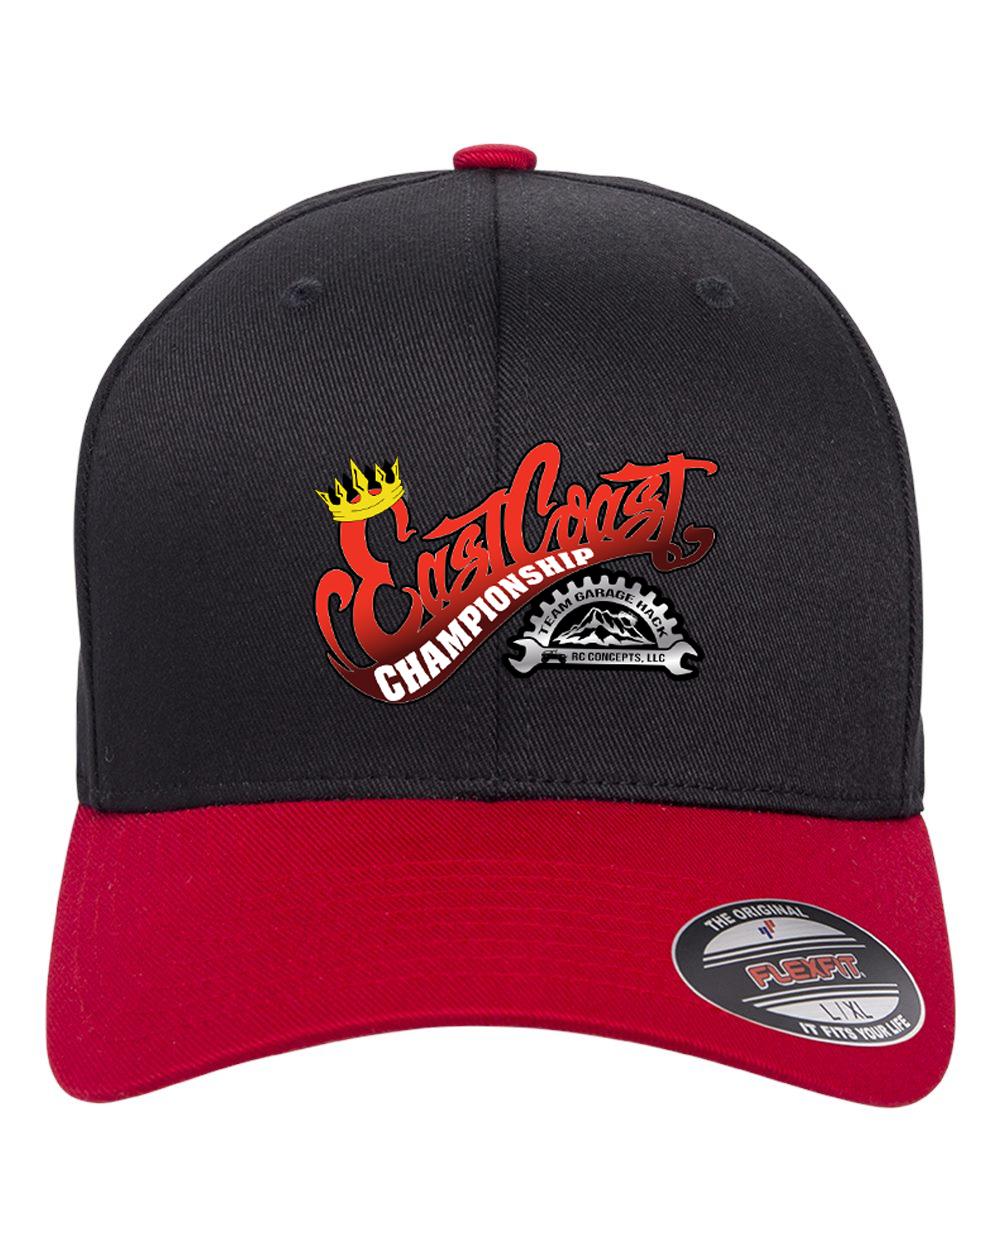 2021 ECC Flexfit Hat